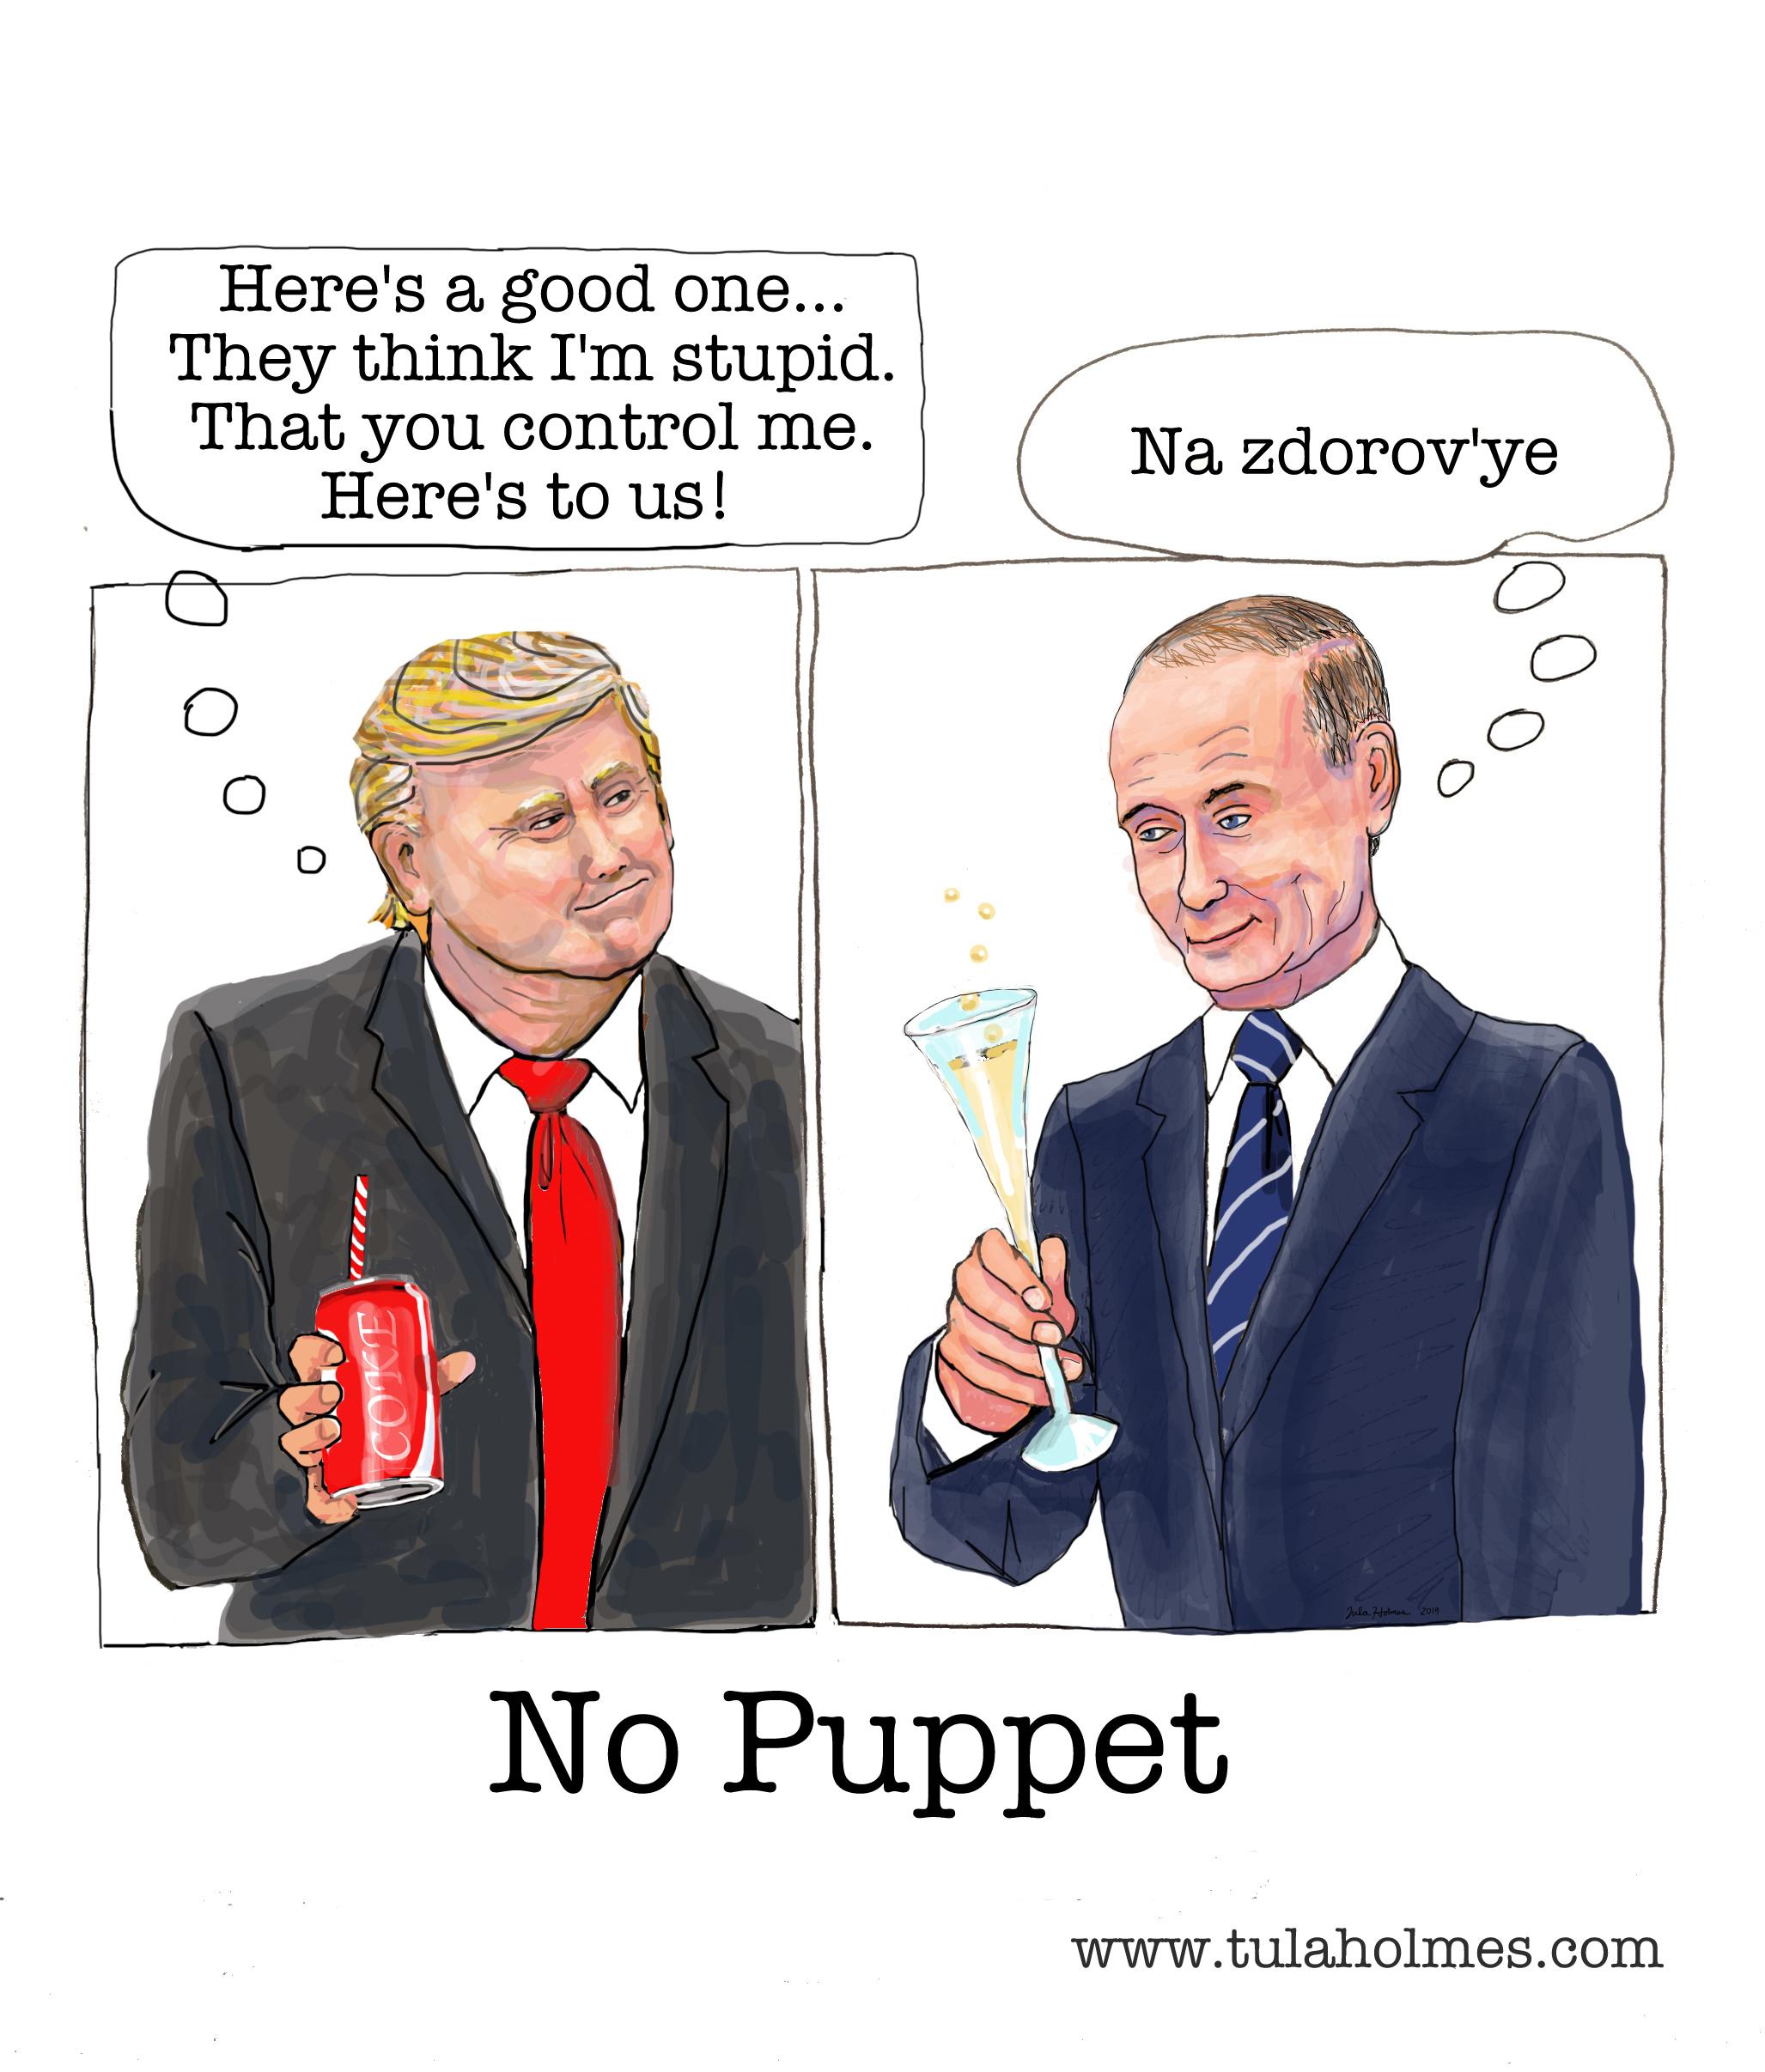 No Puppet- Copyright 2019